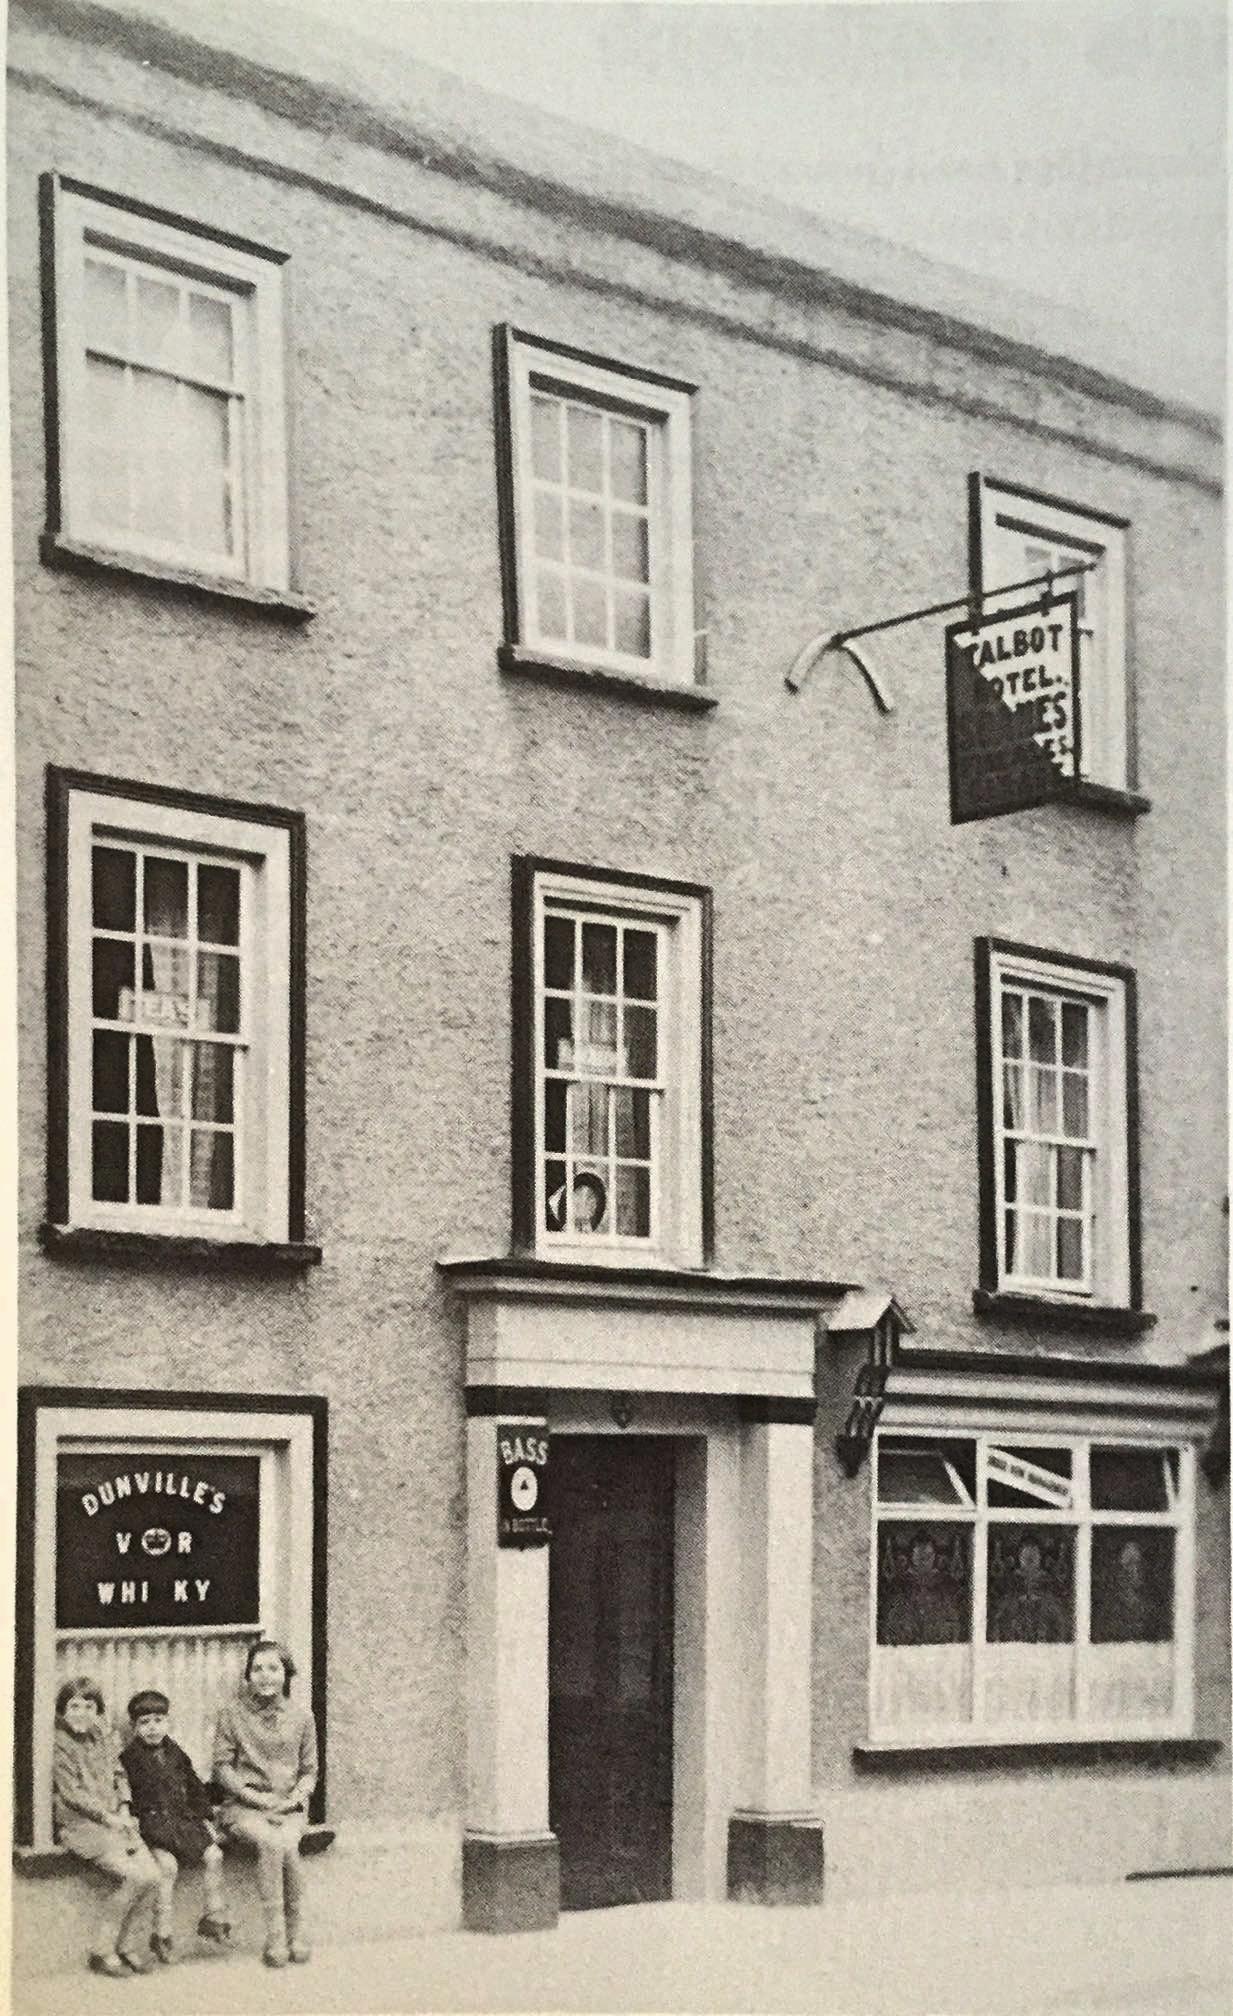 The Talbot Hotel, Holbeach